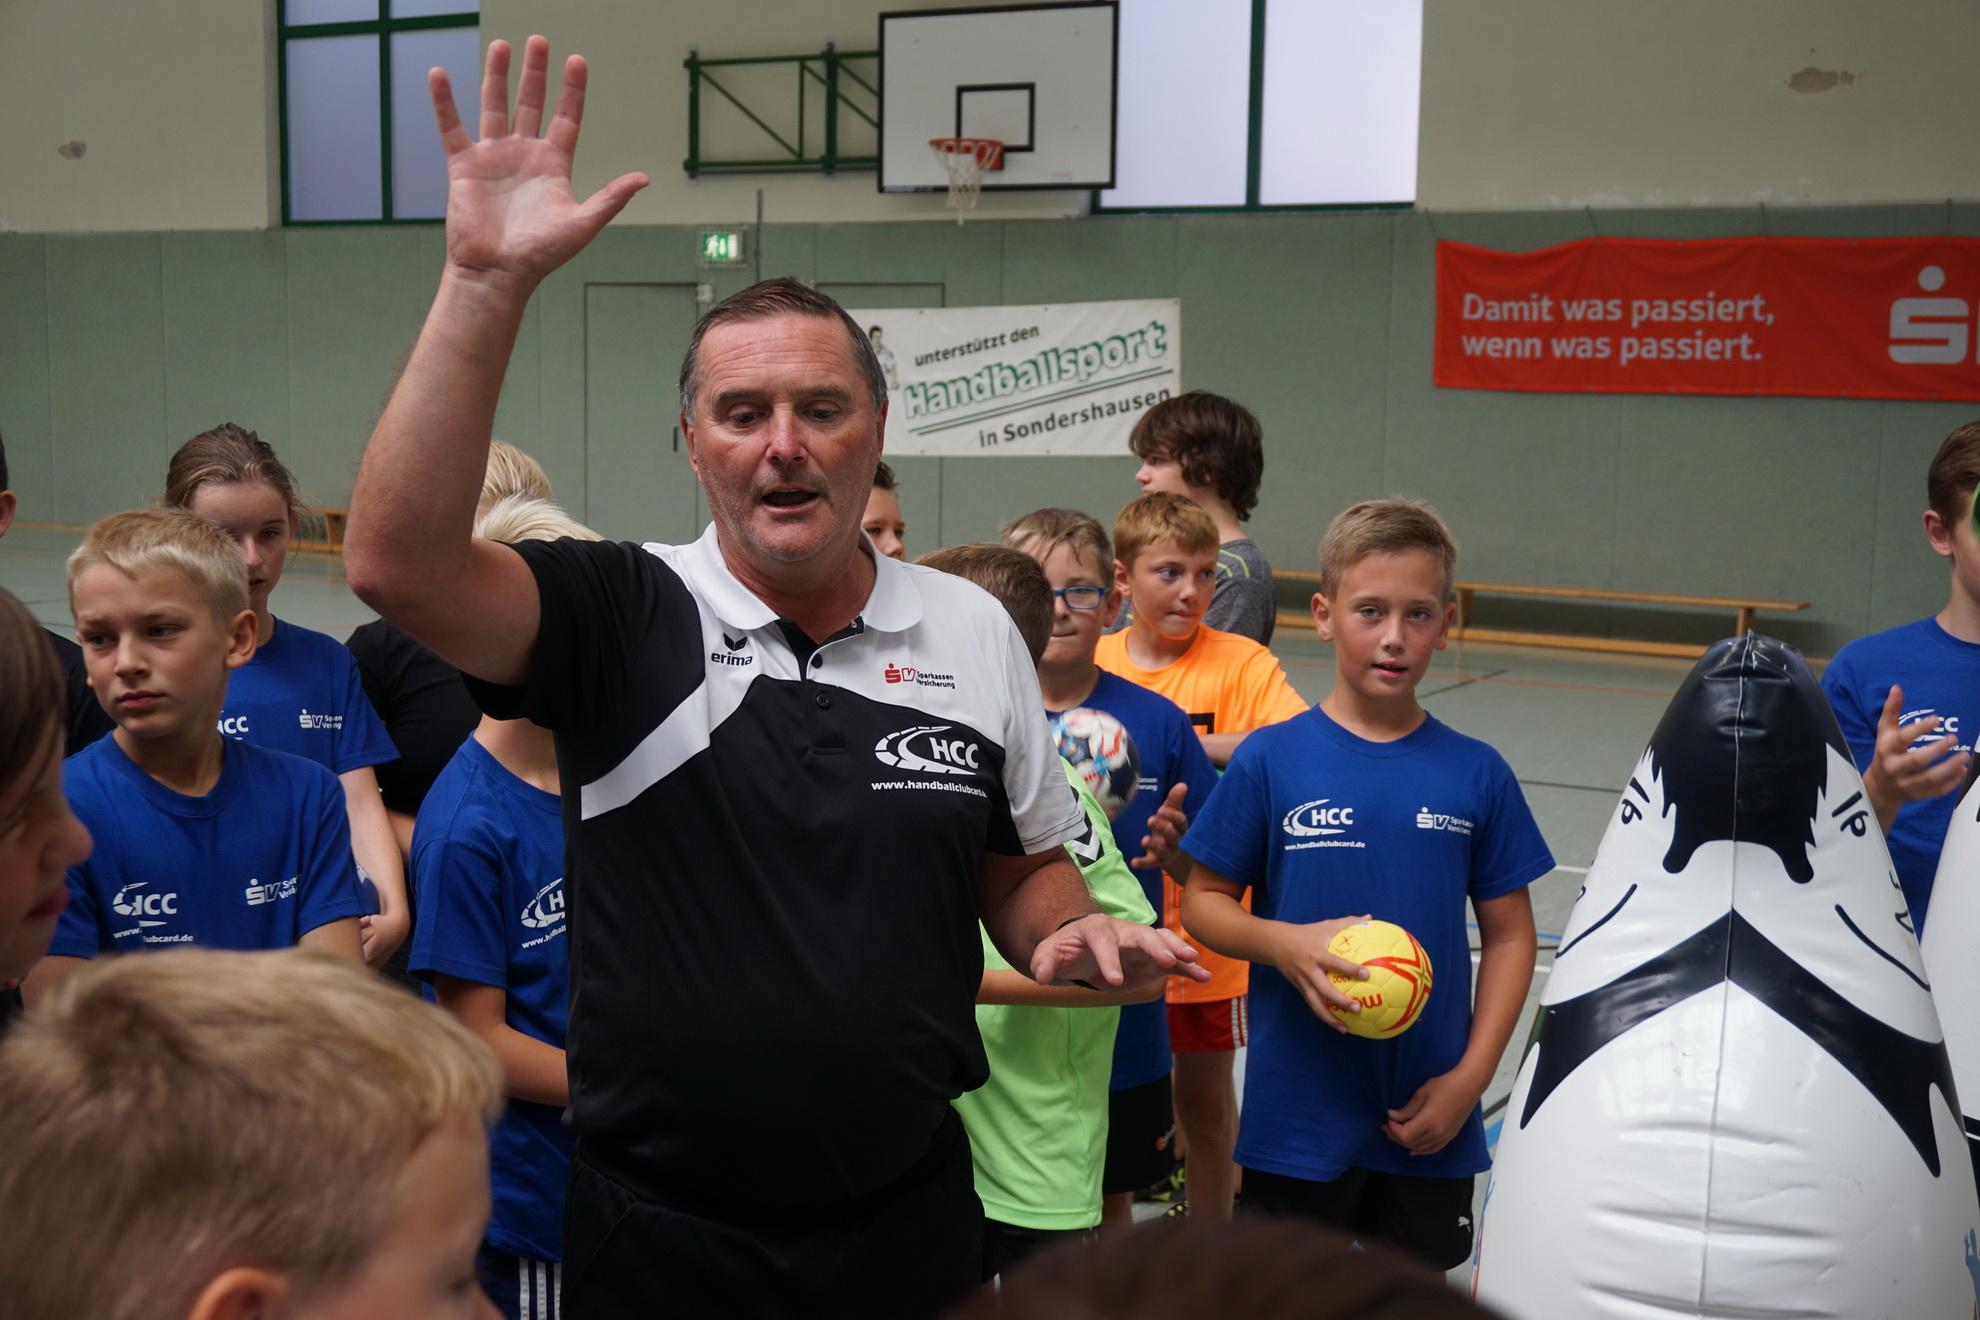 201808_Handballcamp_SDH_MG_201w